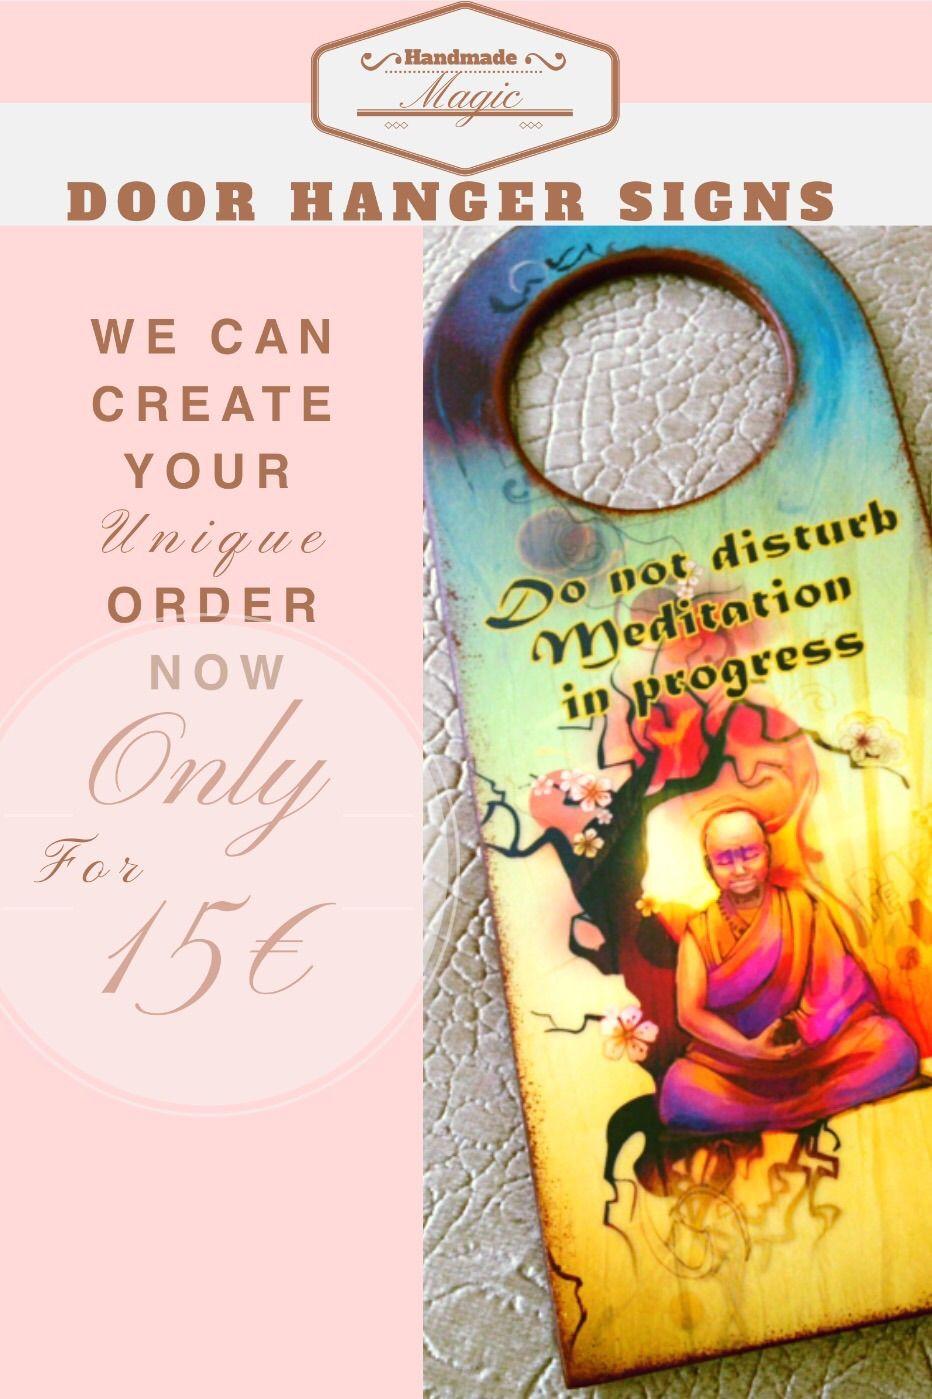 #handmade #handmademagic #doorhanger #sign #yoga #meditation #homedecor #buddha